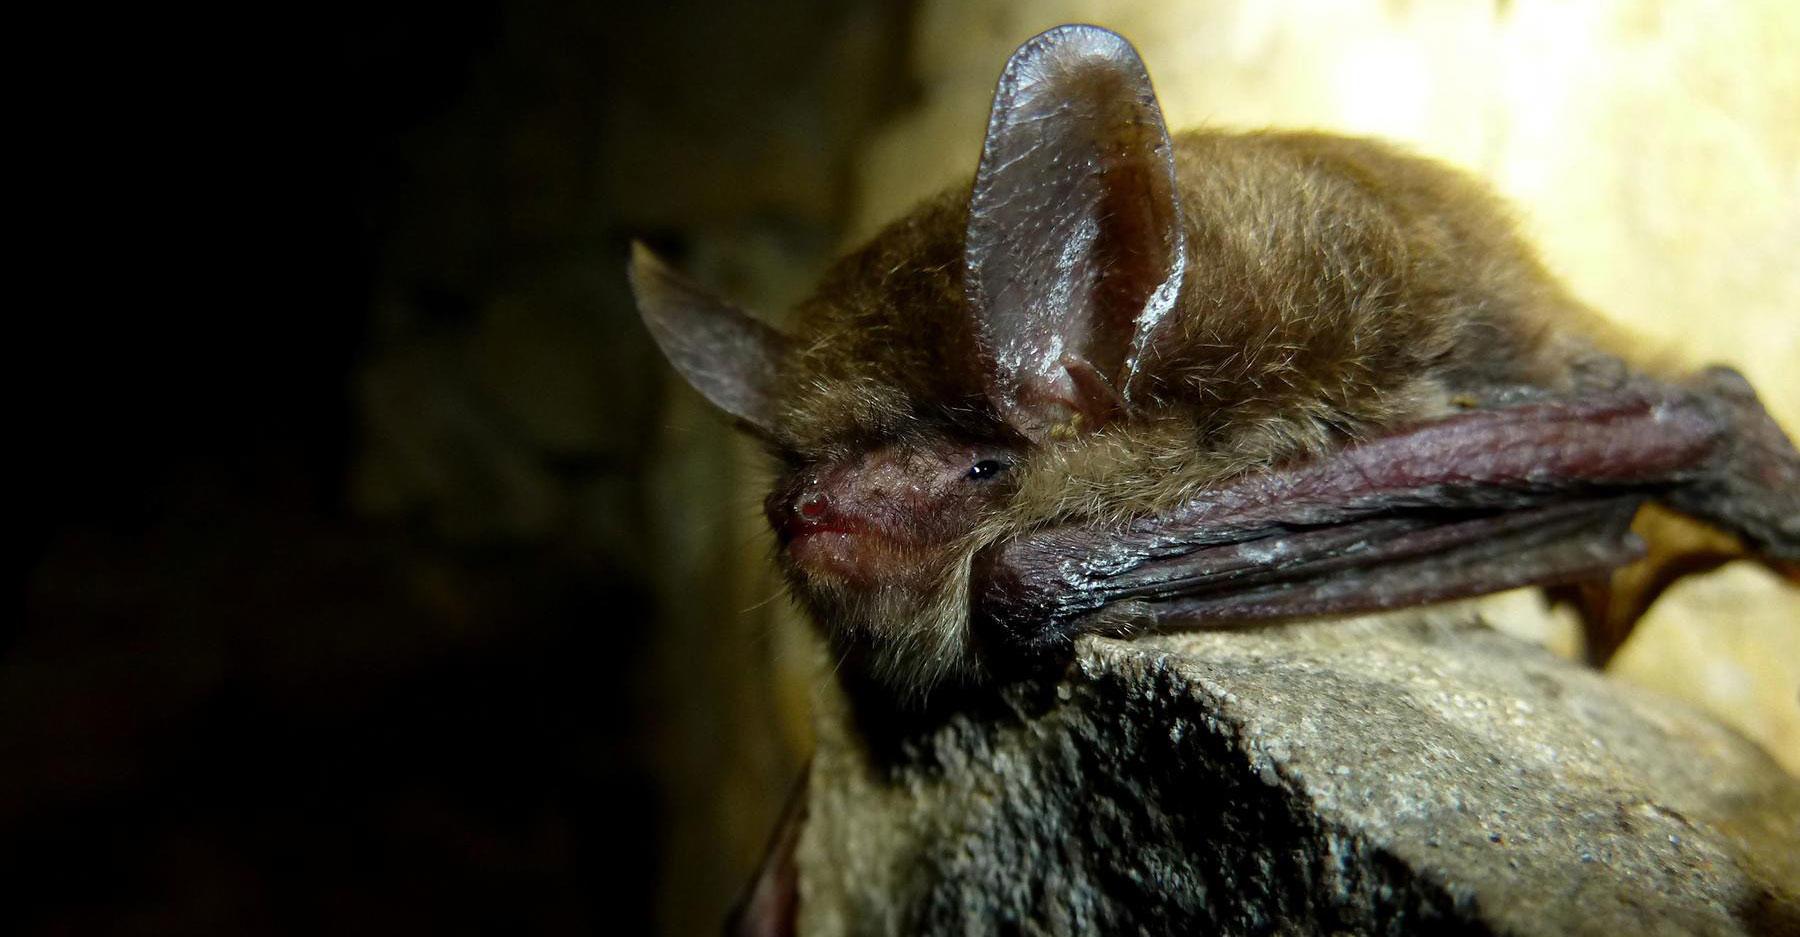 Northern long-eared bat